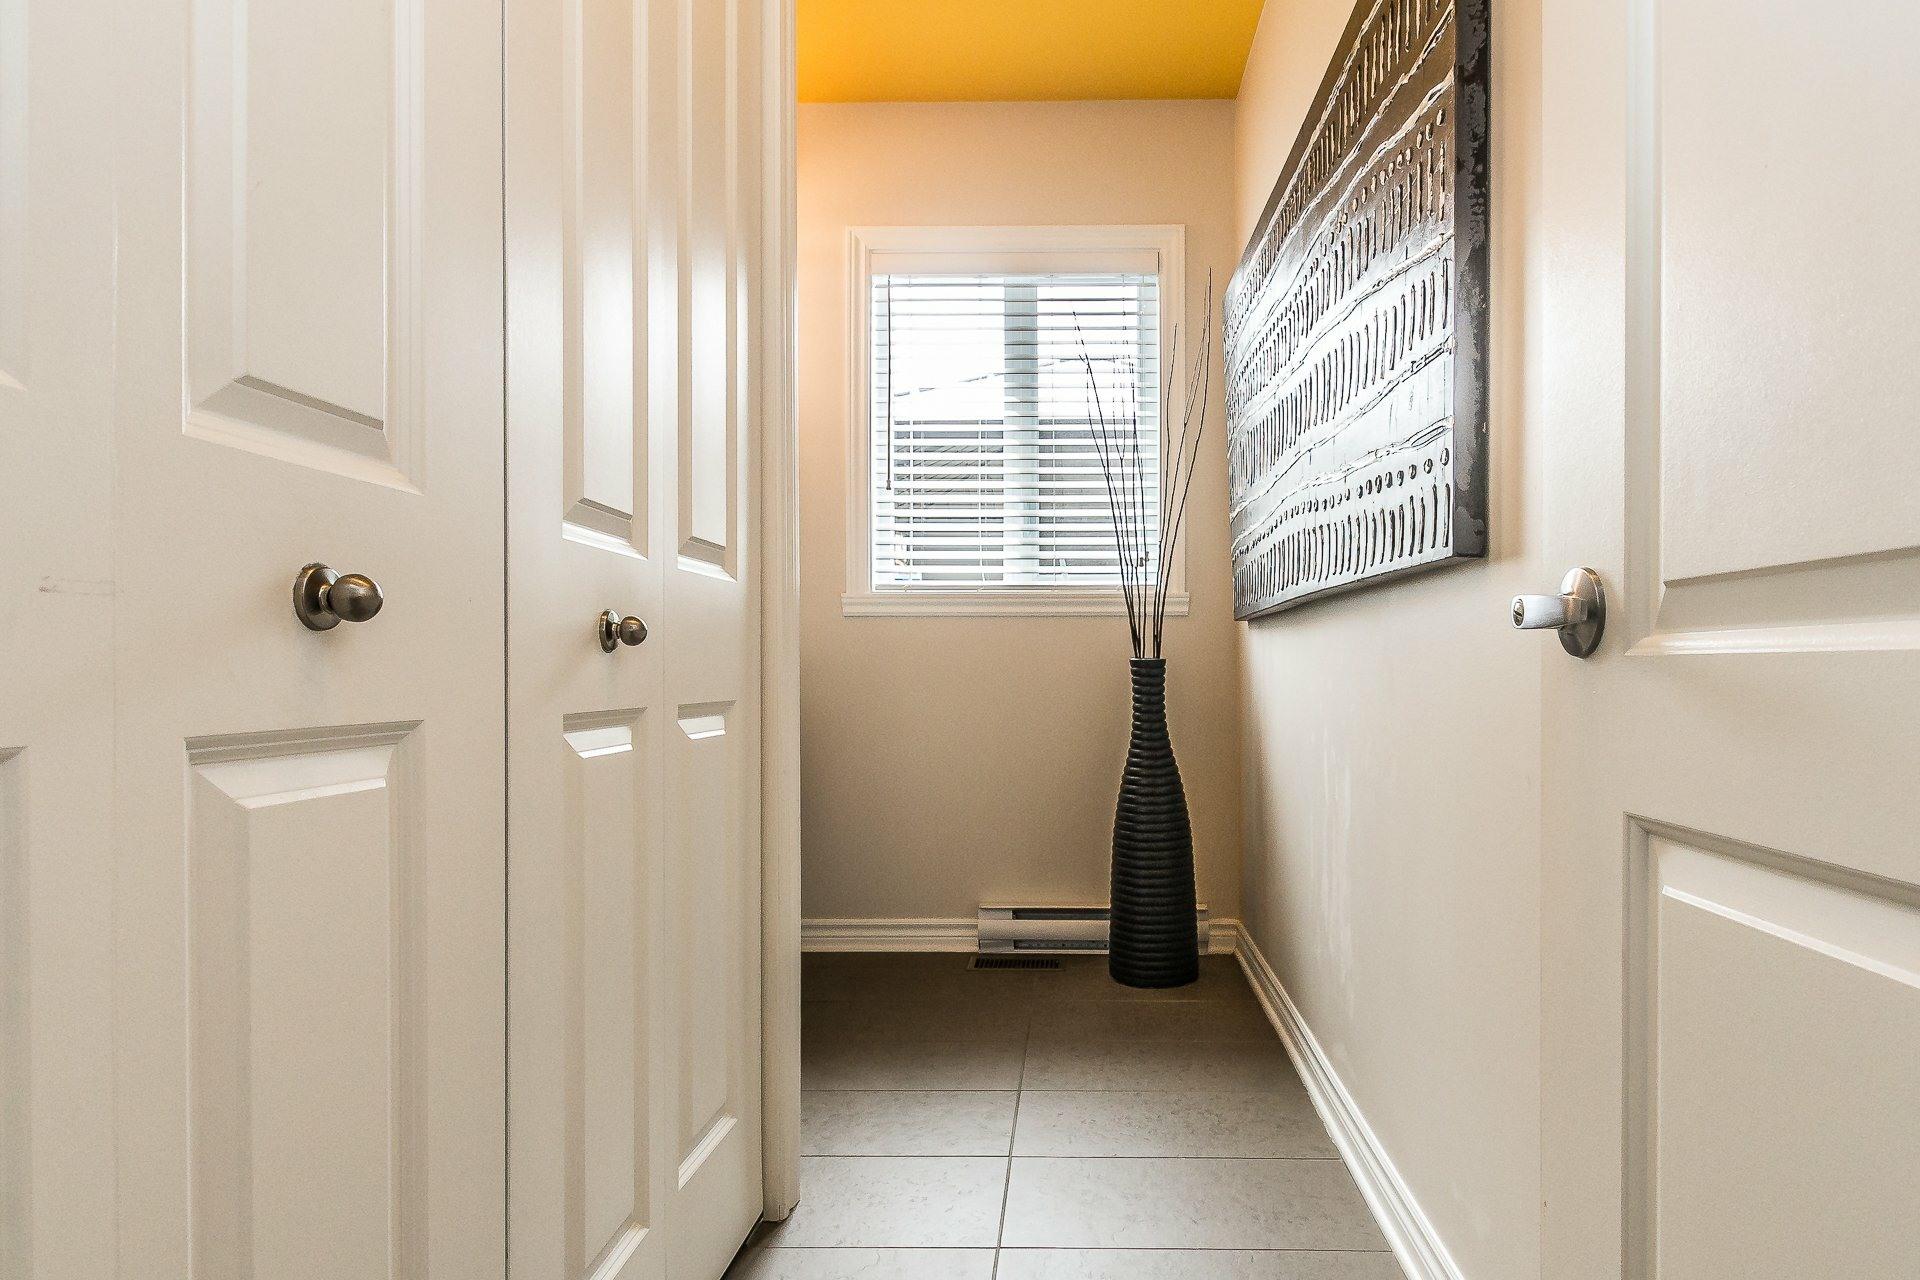 image 34 - MX - Casa sola - MX En venta Montréal Lachine  - 8 habitaciones